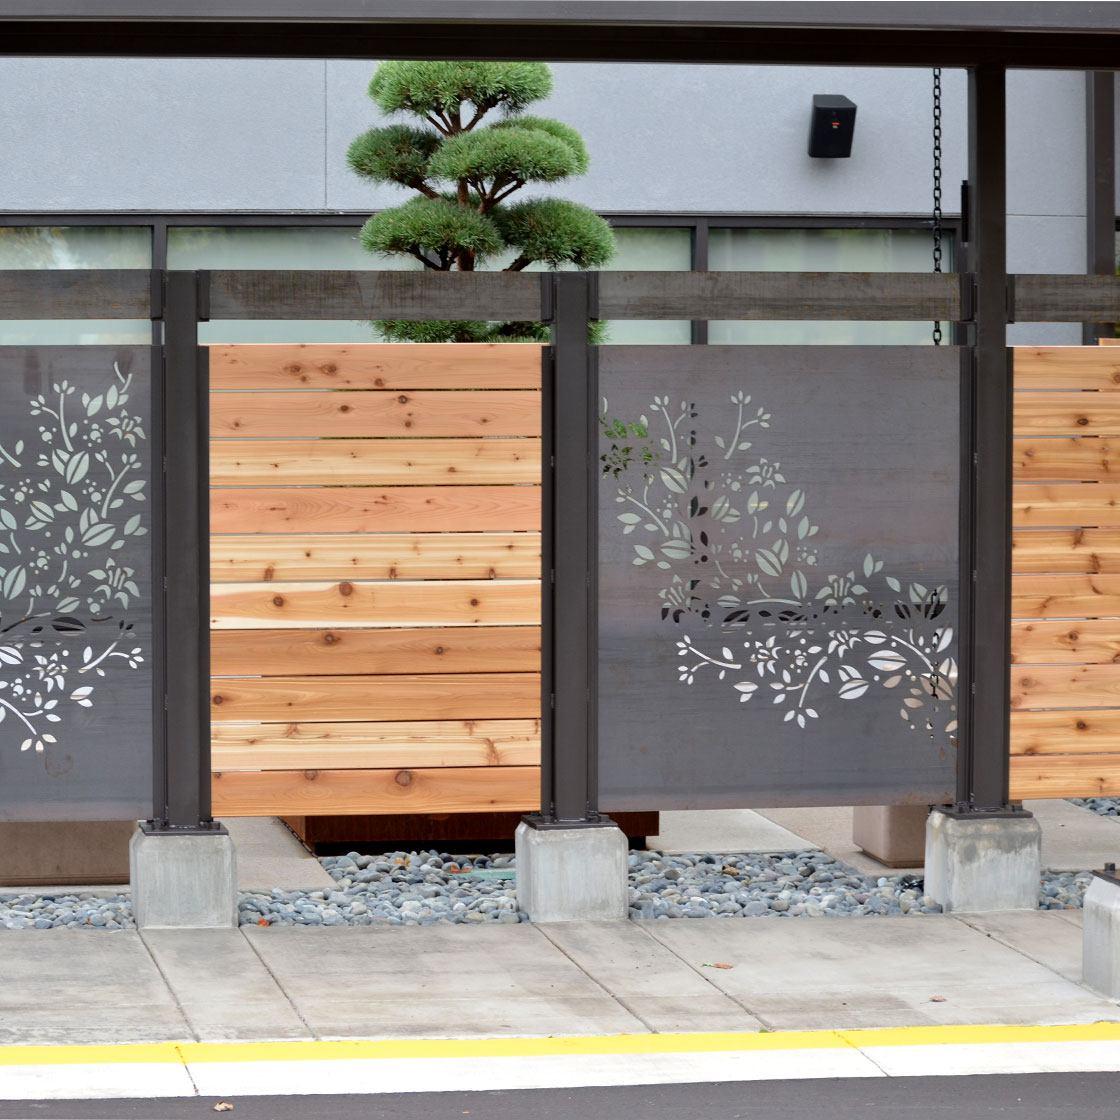 A decorative fence